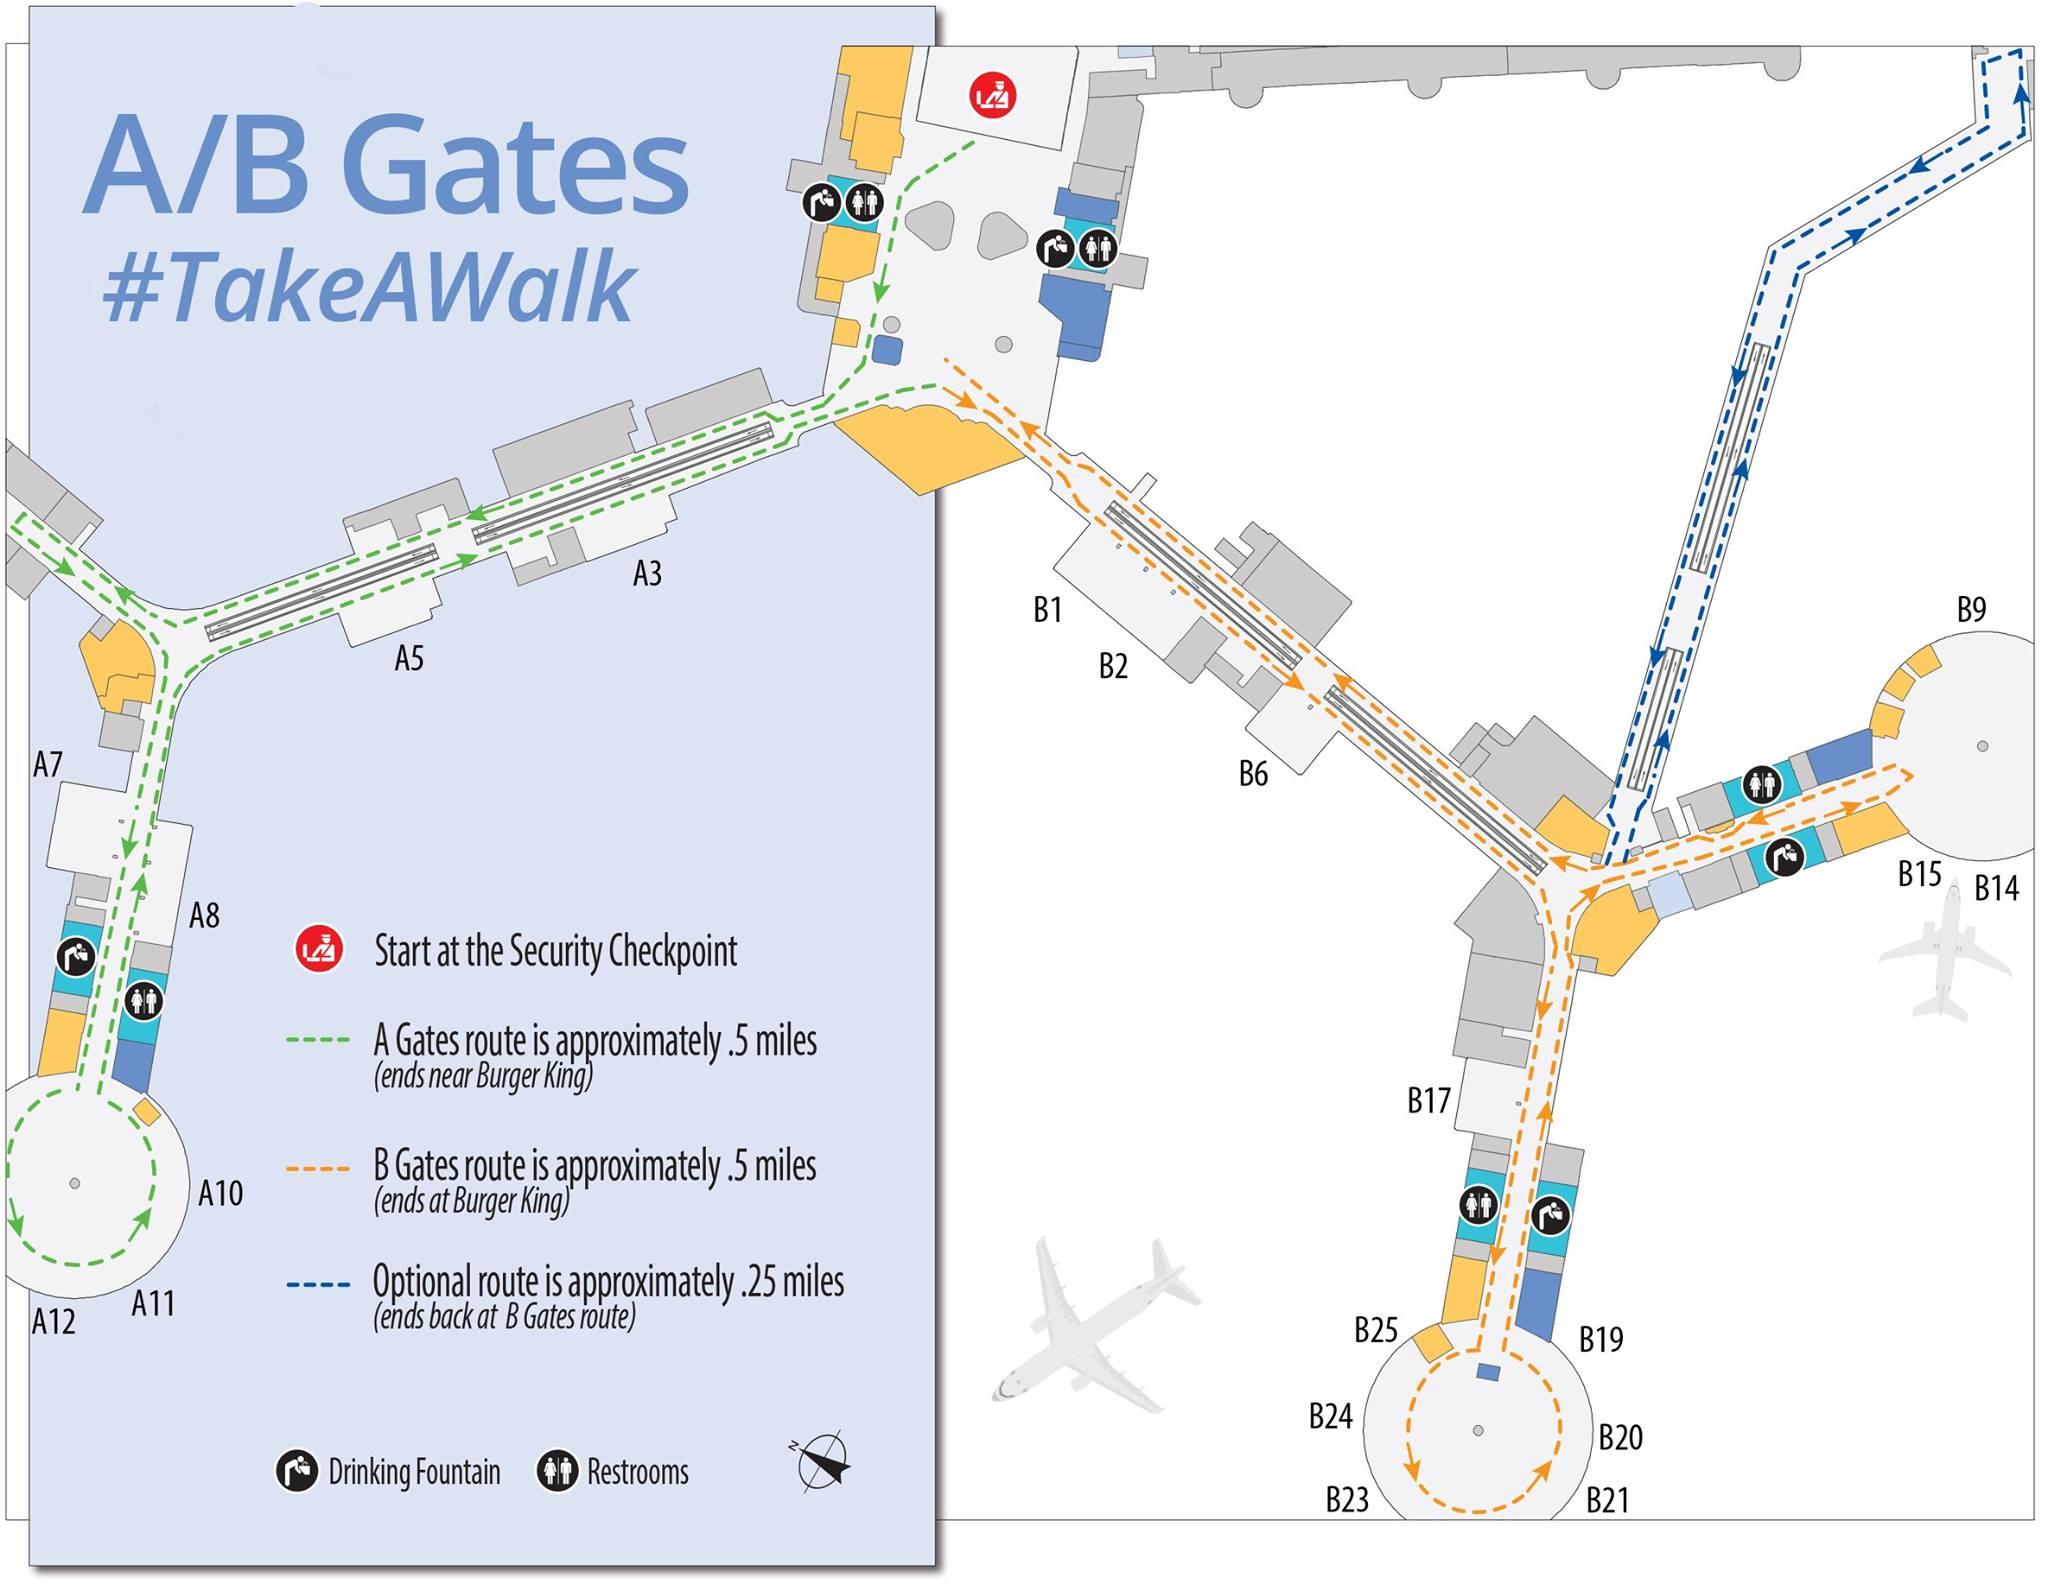 Fit Travel Tips Walking Routes Enroute Business Travel Life - Las vegas walking map